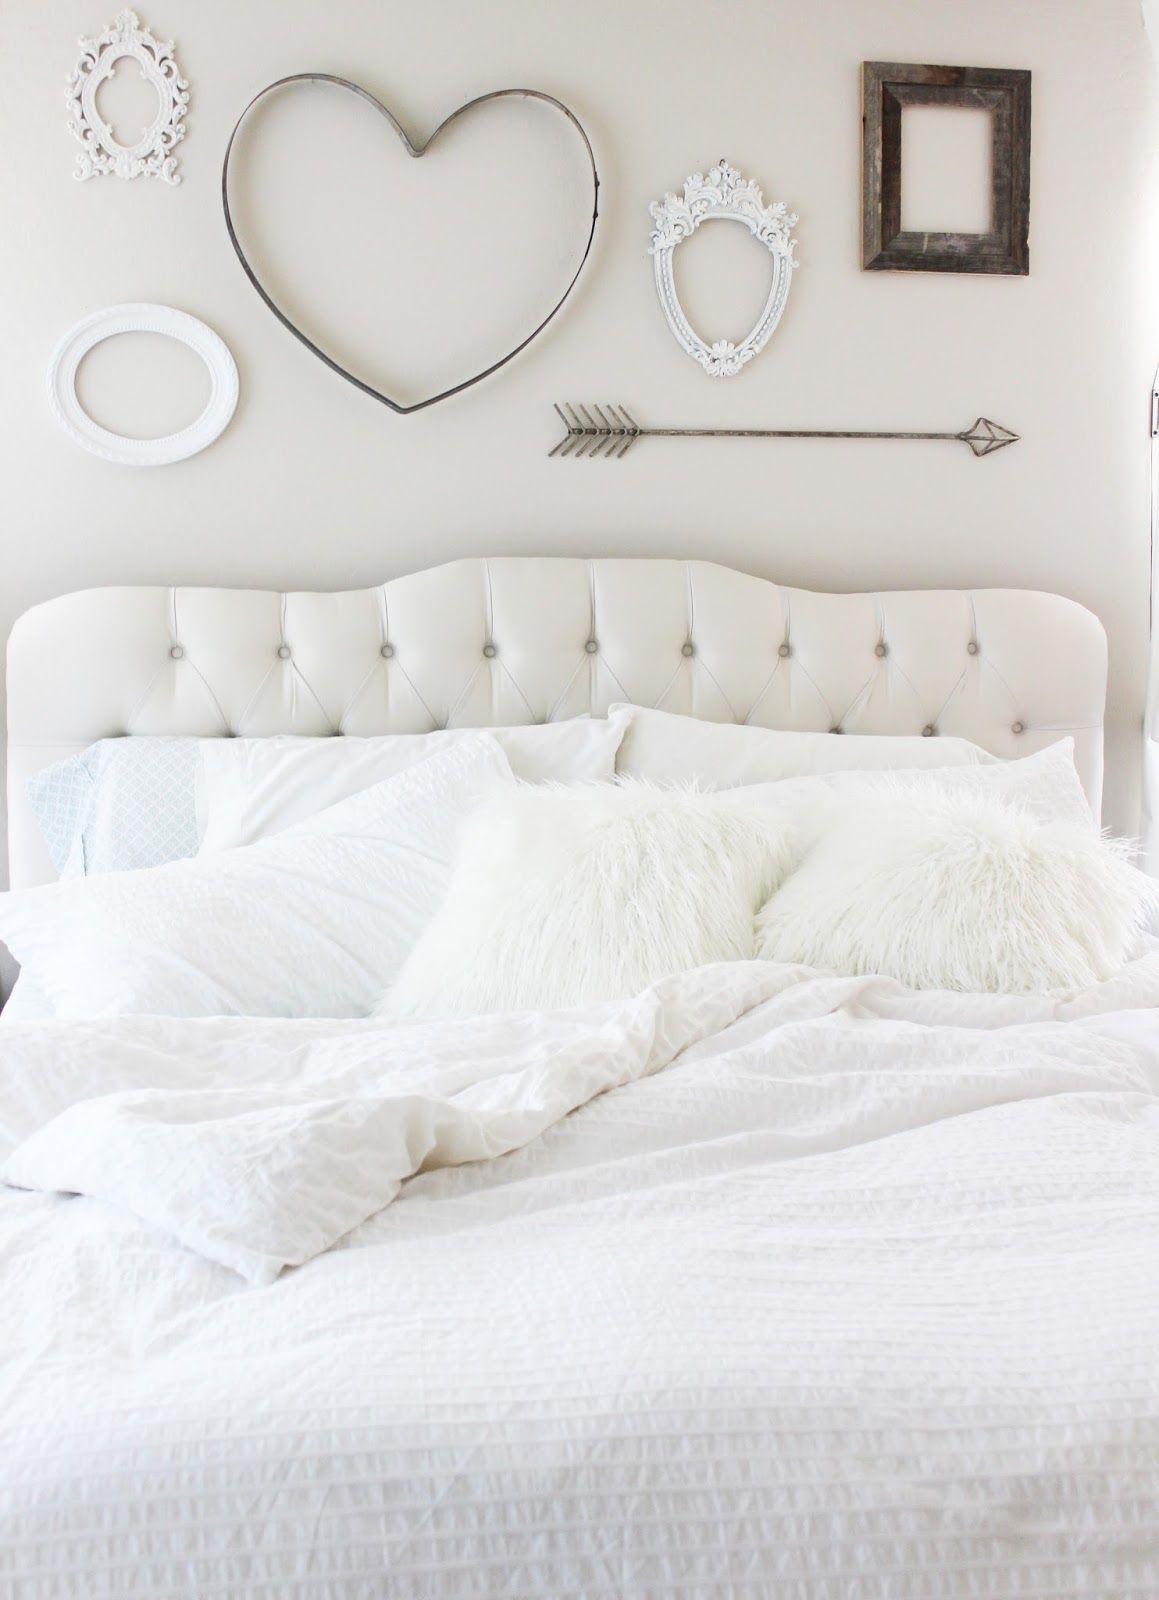 Master bedroom inspiration  I shared last week  here  the inspiration for our master bedroom